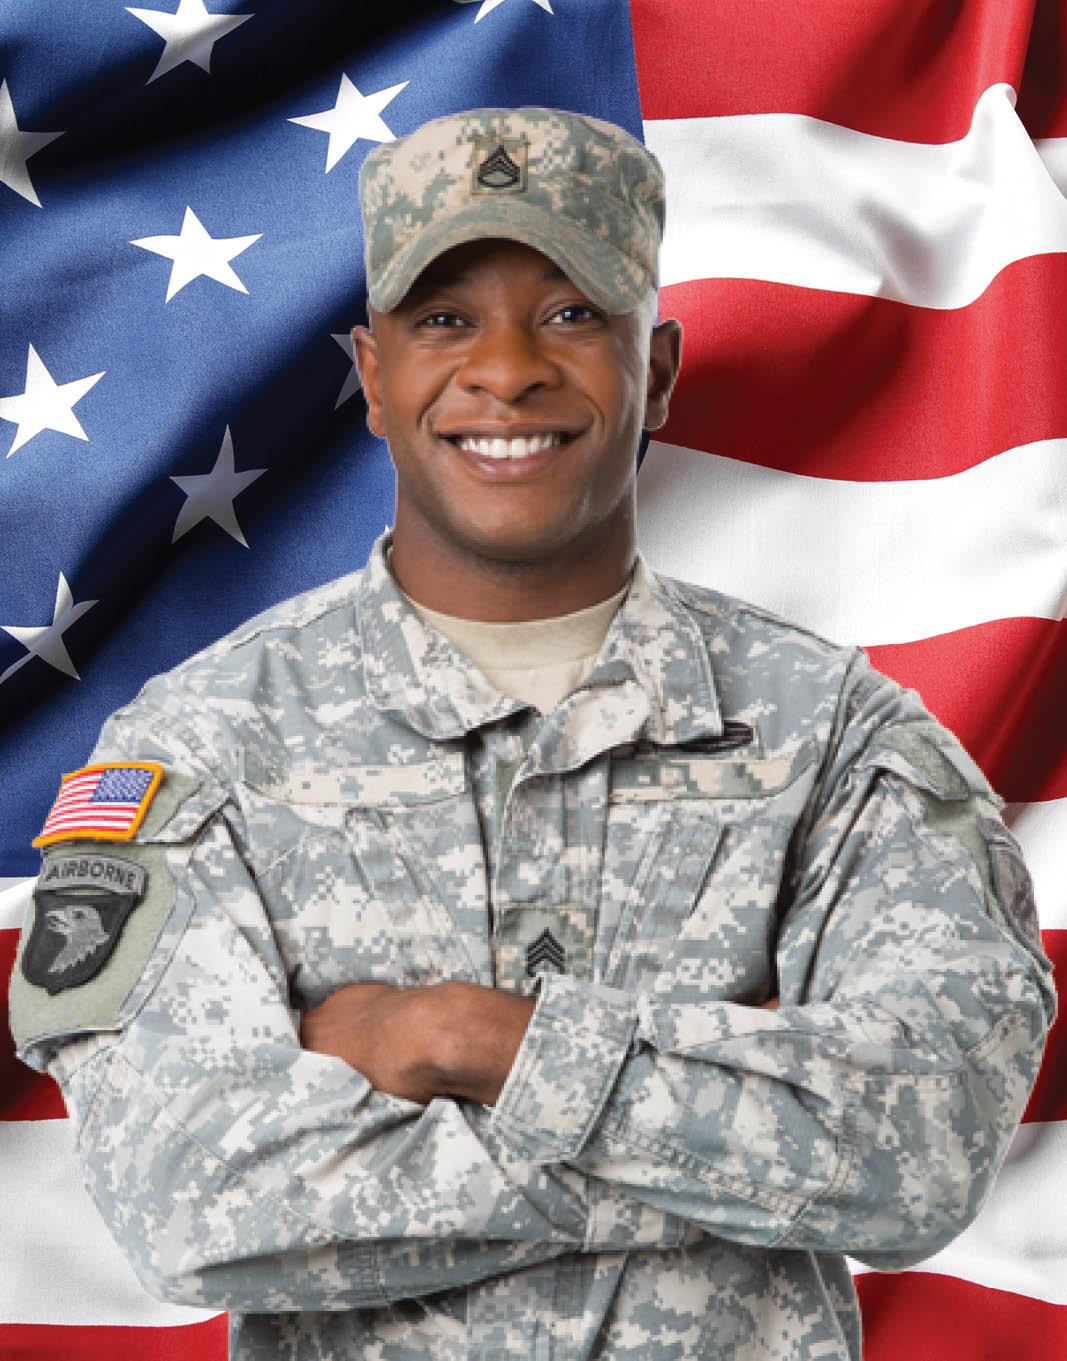 U.S. Military Veterans